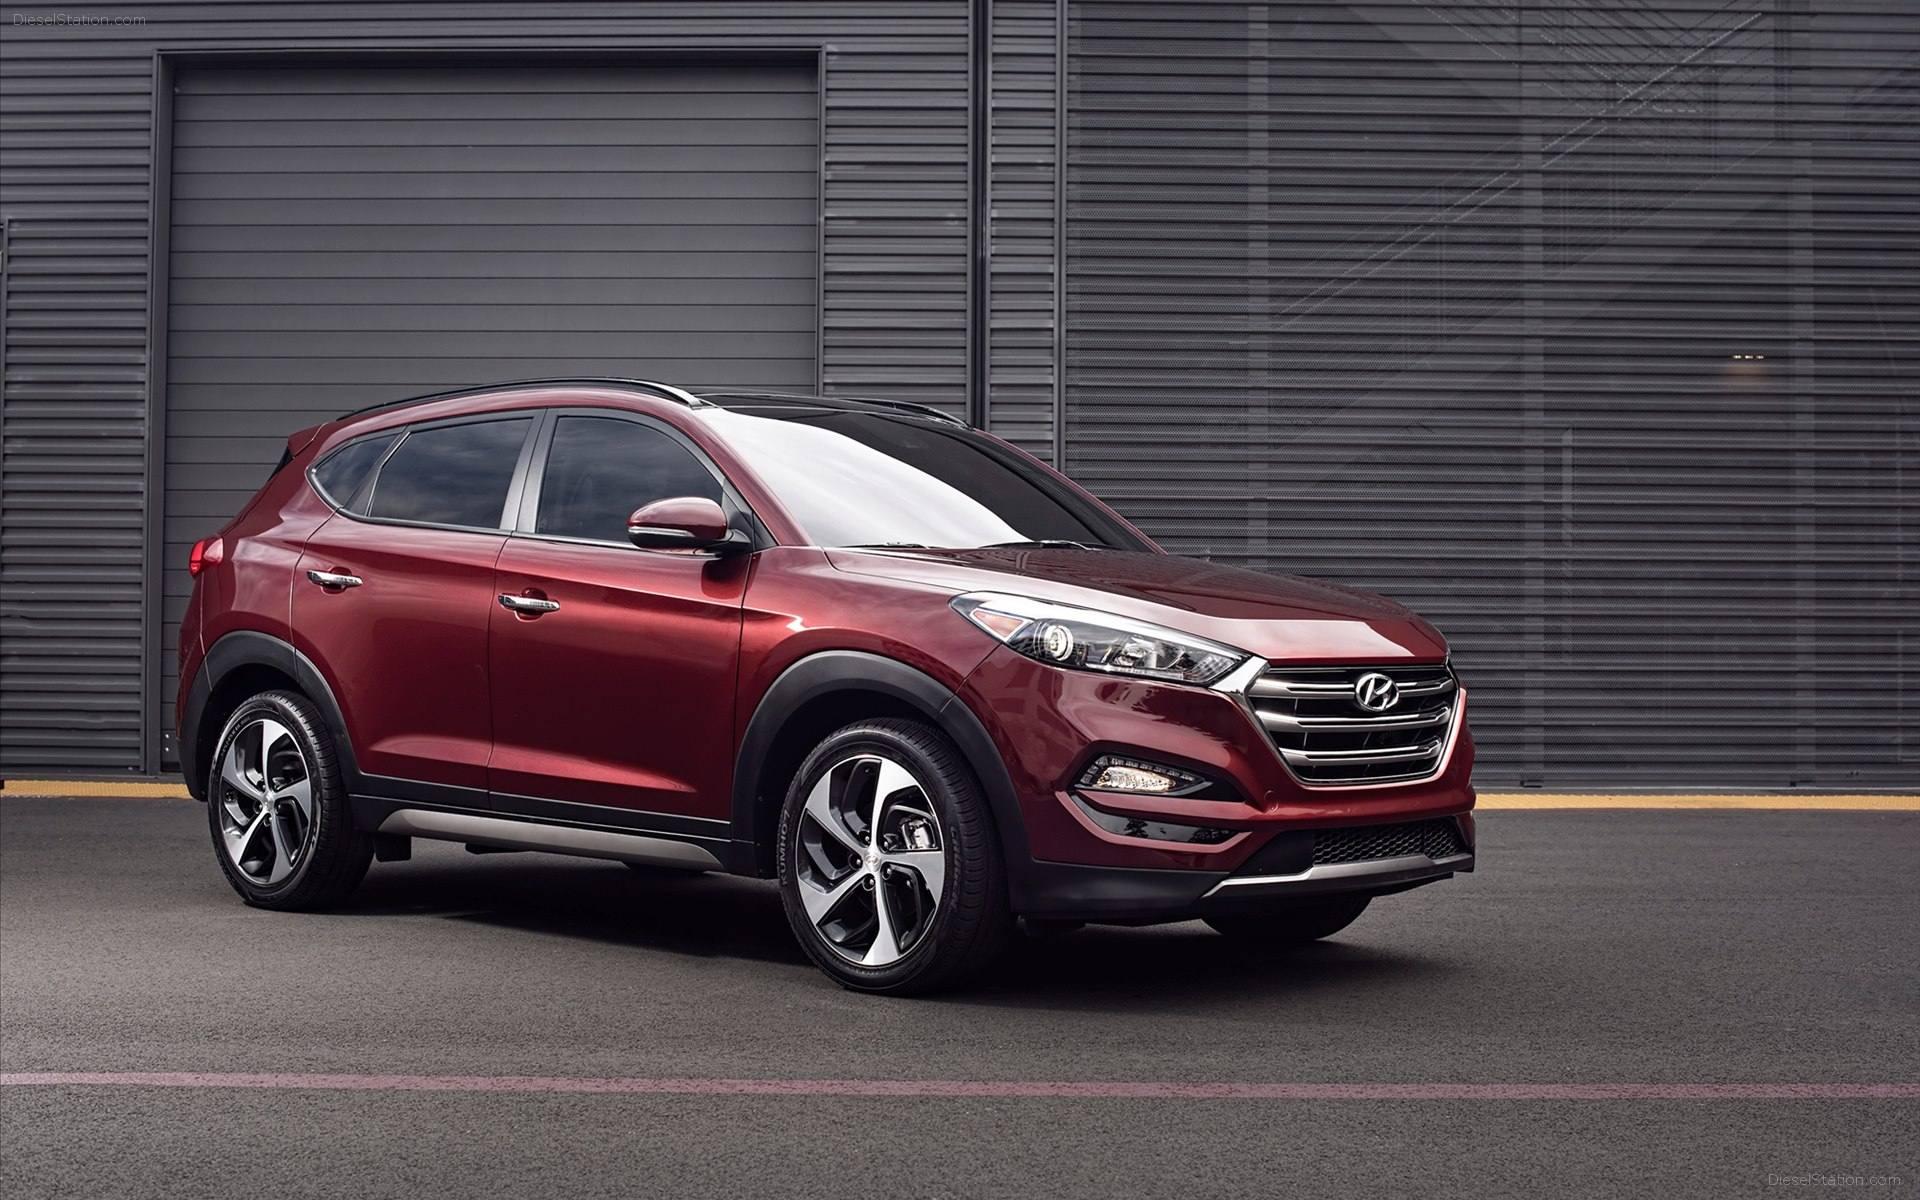 Hyundai-Tucson-2016-widescreen-04